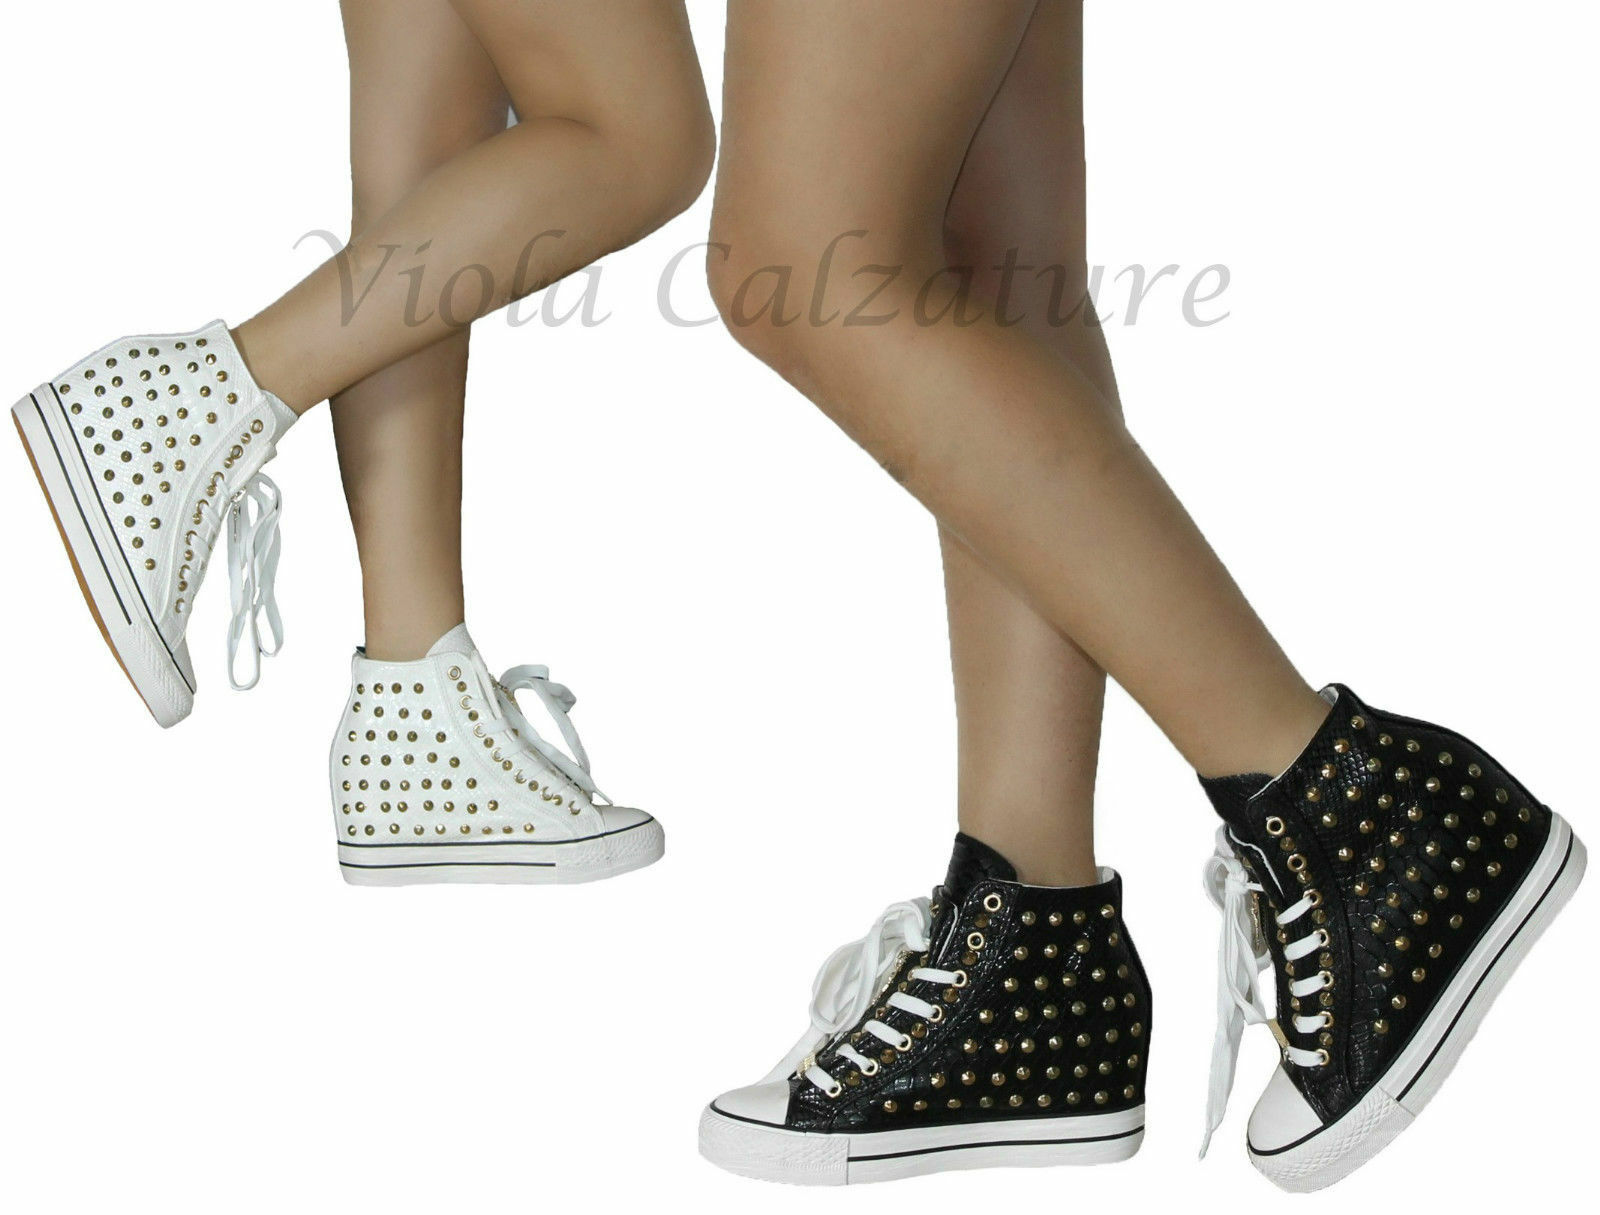 Scarpe Donna Sneakers Borchie Zeppa interna comode n°36 37 38 39 40 41 art 2360